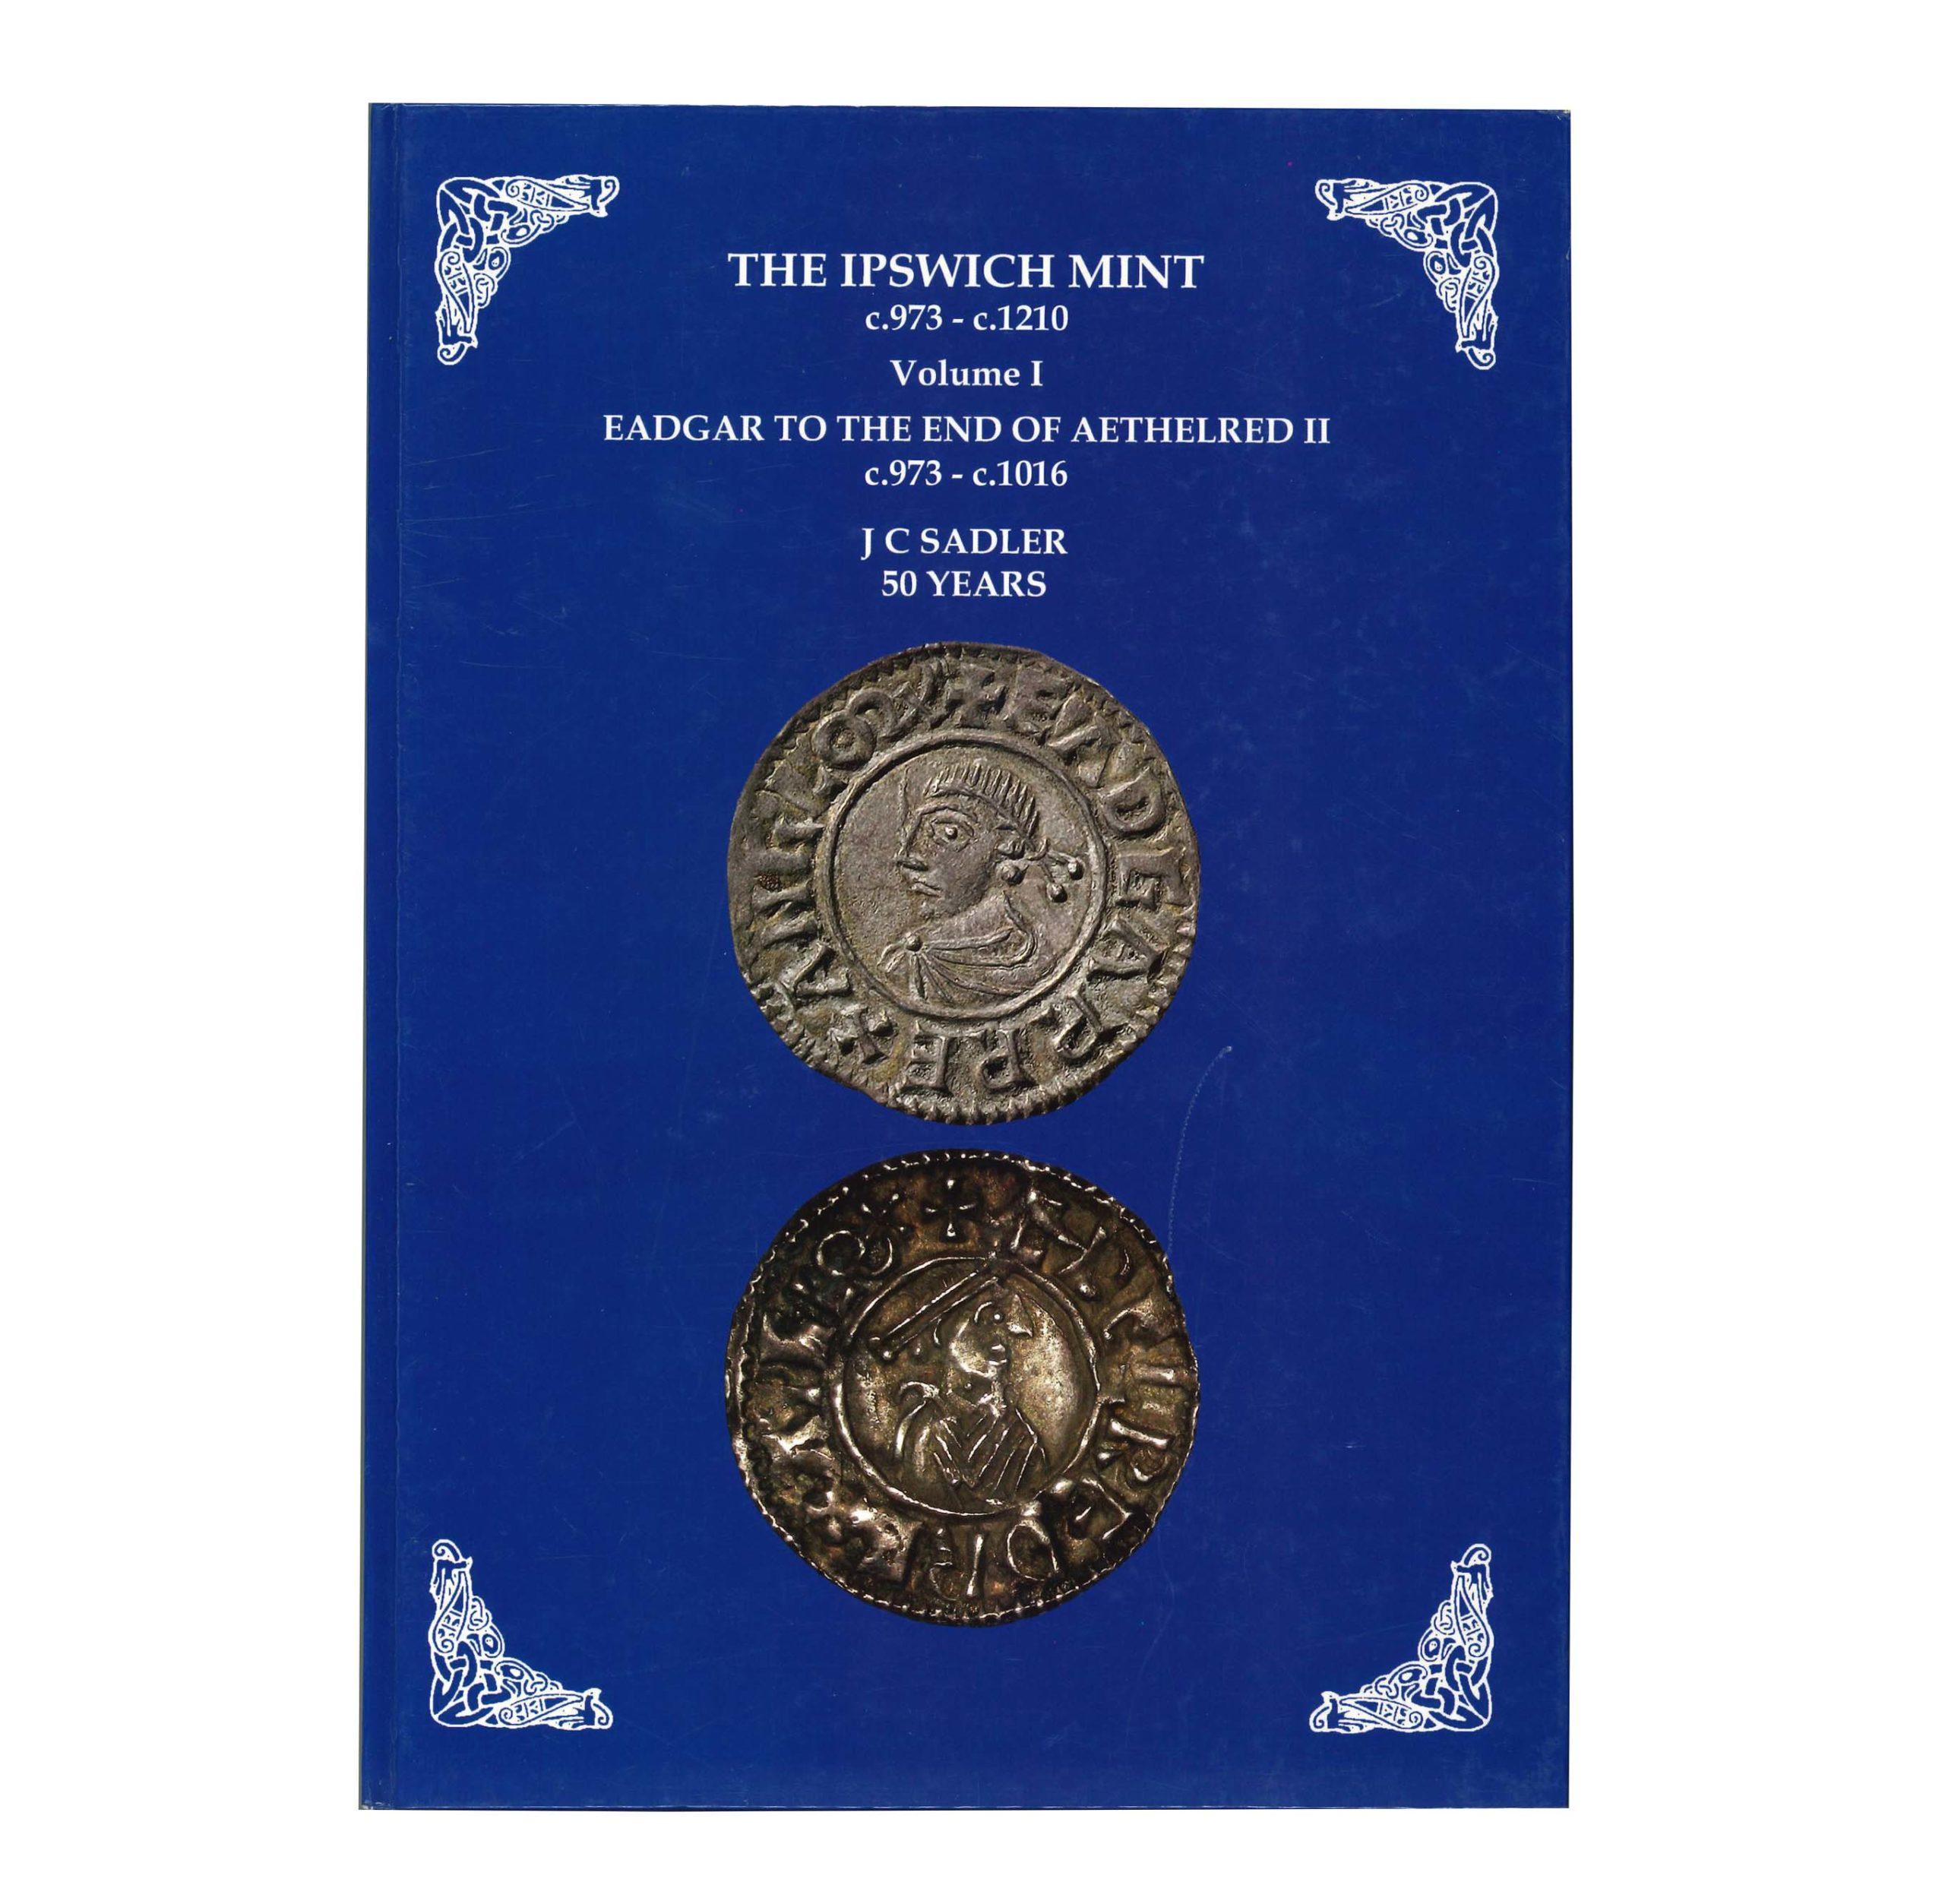 The Ipswich Mint c.973 - c.1016, volume I